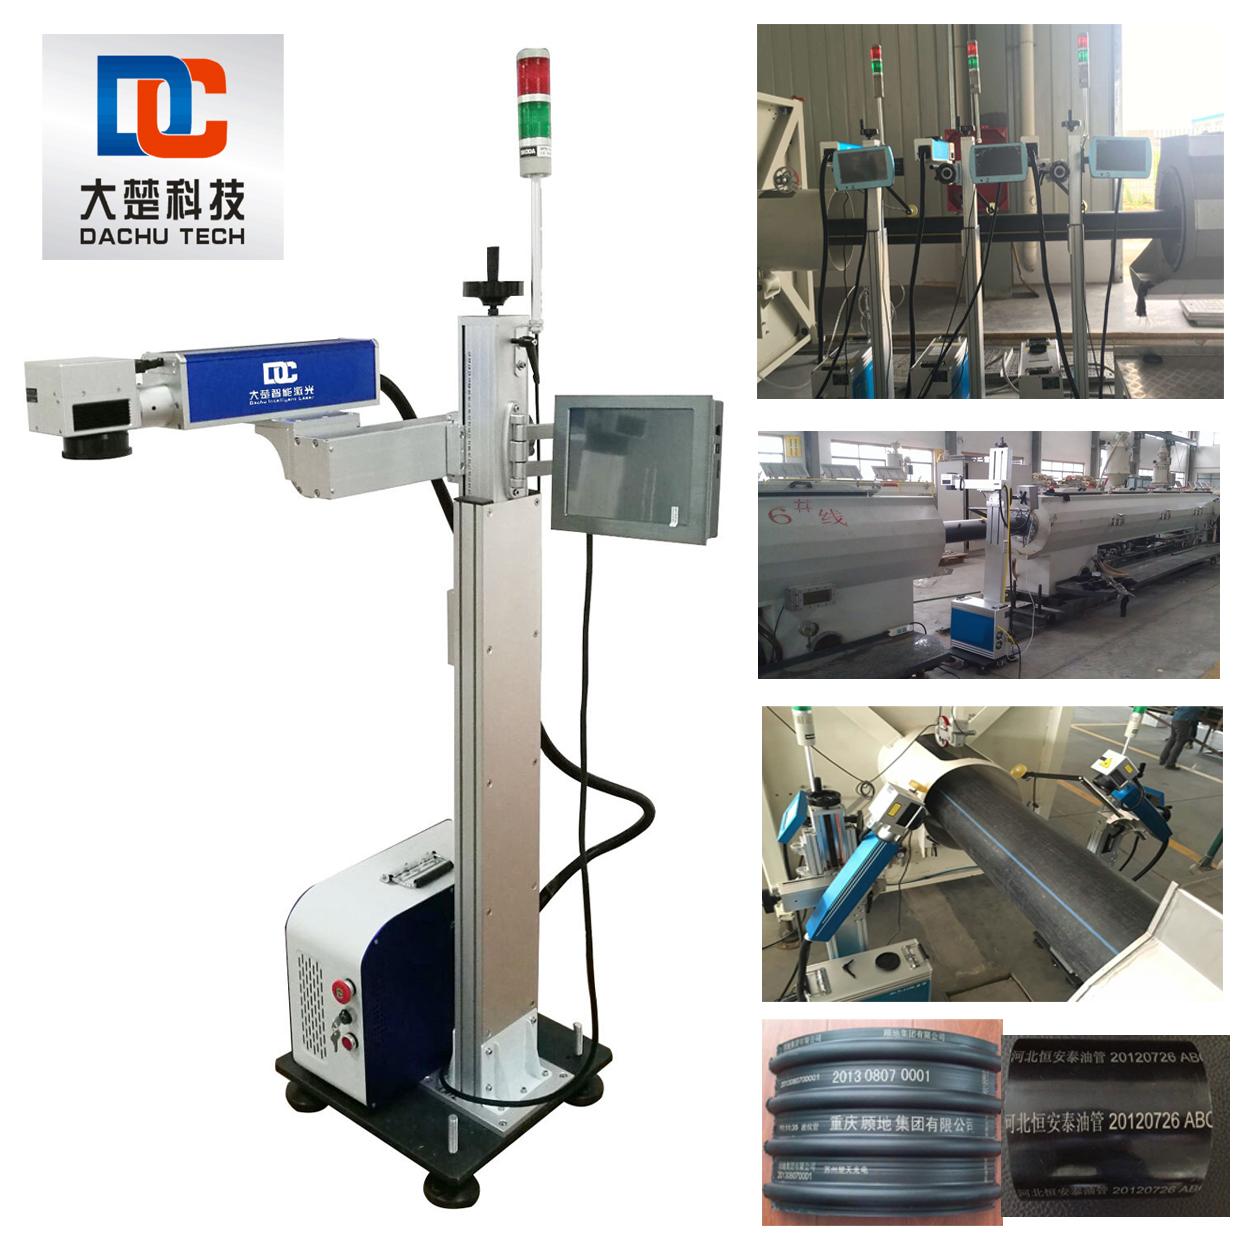 Portable 20W Fiber Laser Marking Machine Laser Printing Online for PE Plastic Pipeline